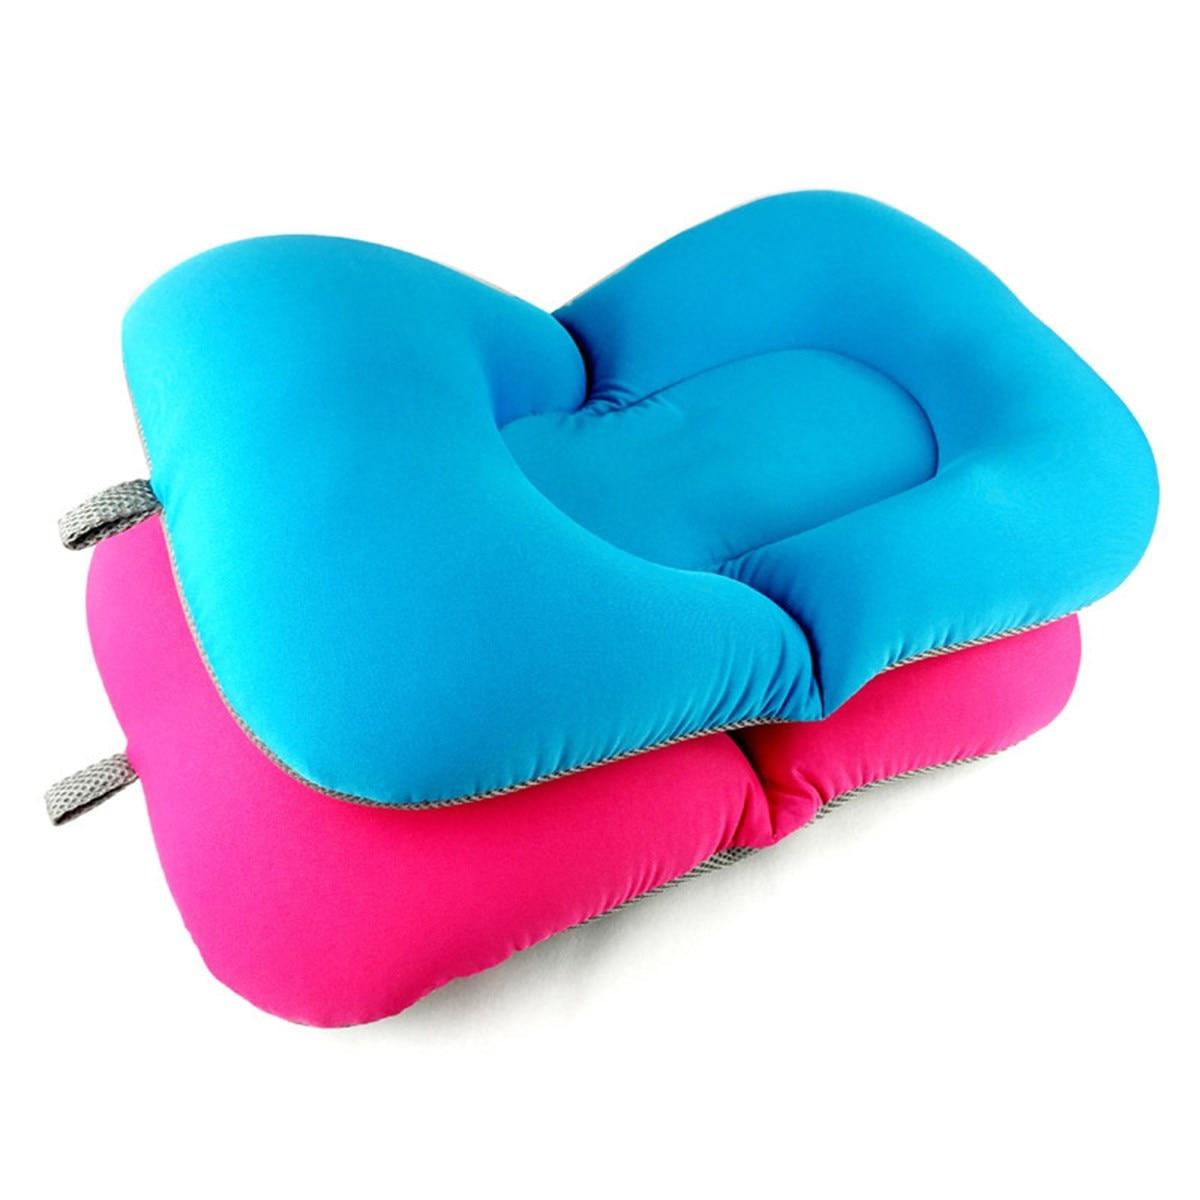 Baby Pillow Chair Hardwood Floor Leg Protectors Elastic Fabric Bath Tub Pad Lounger Air